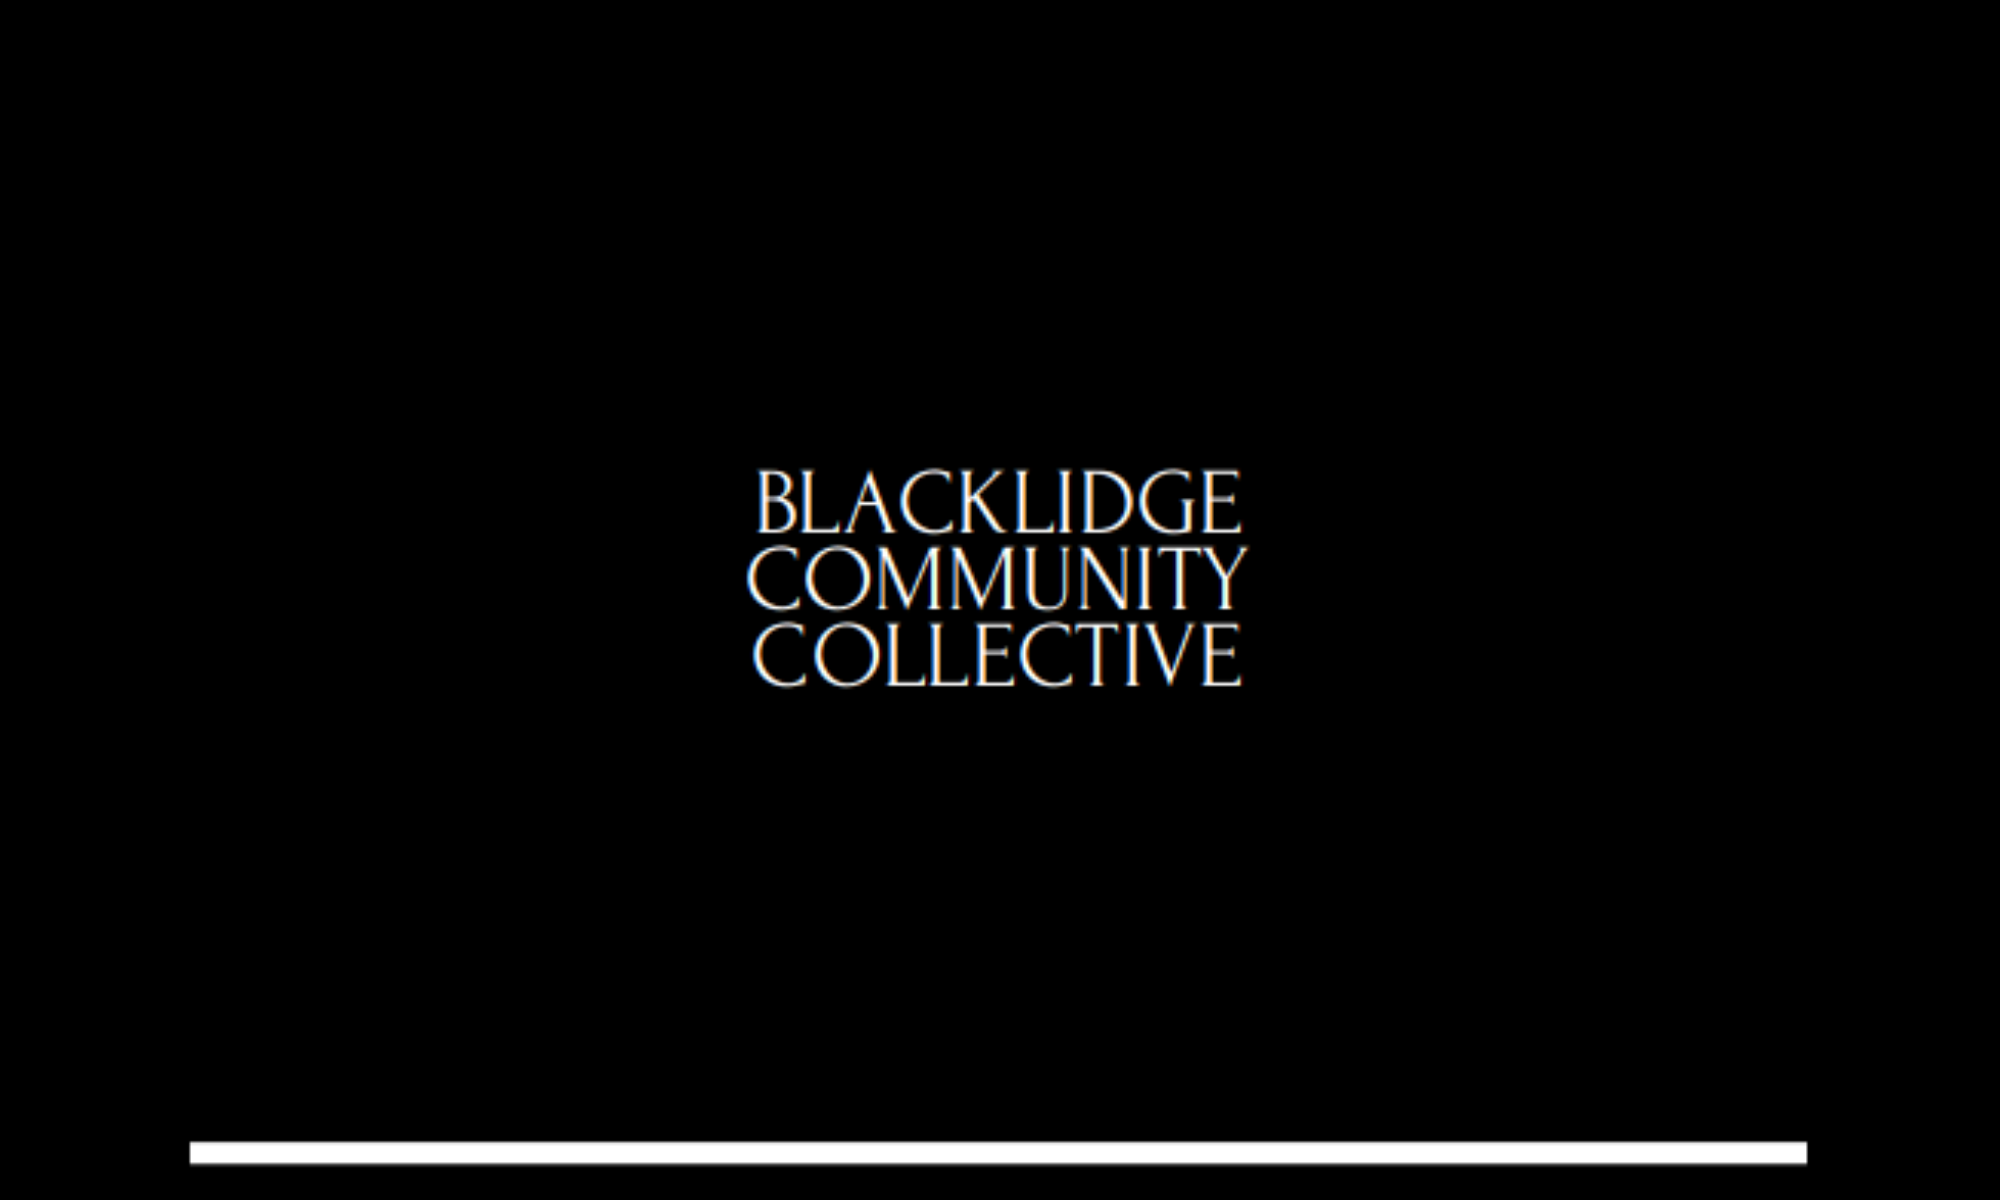 Blacklidge Community Collective